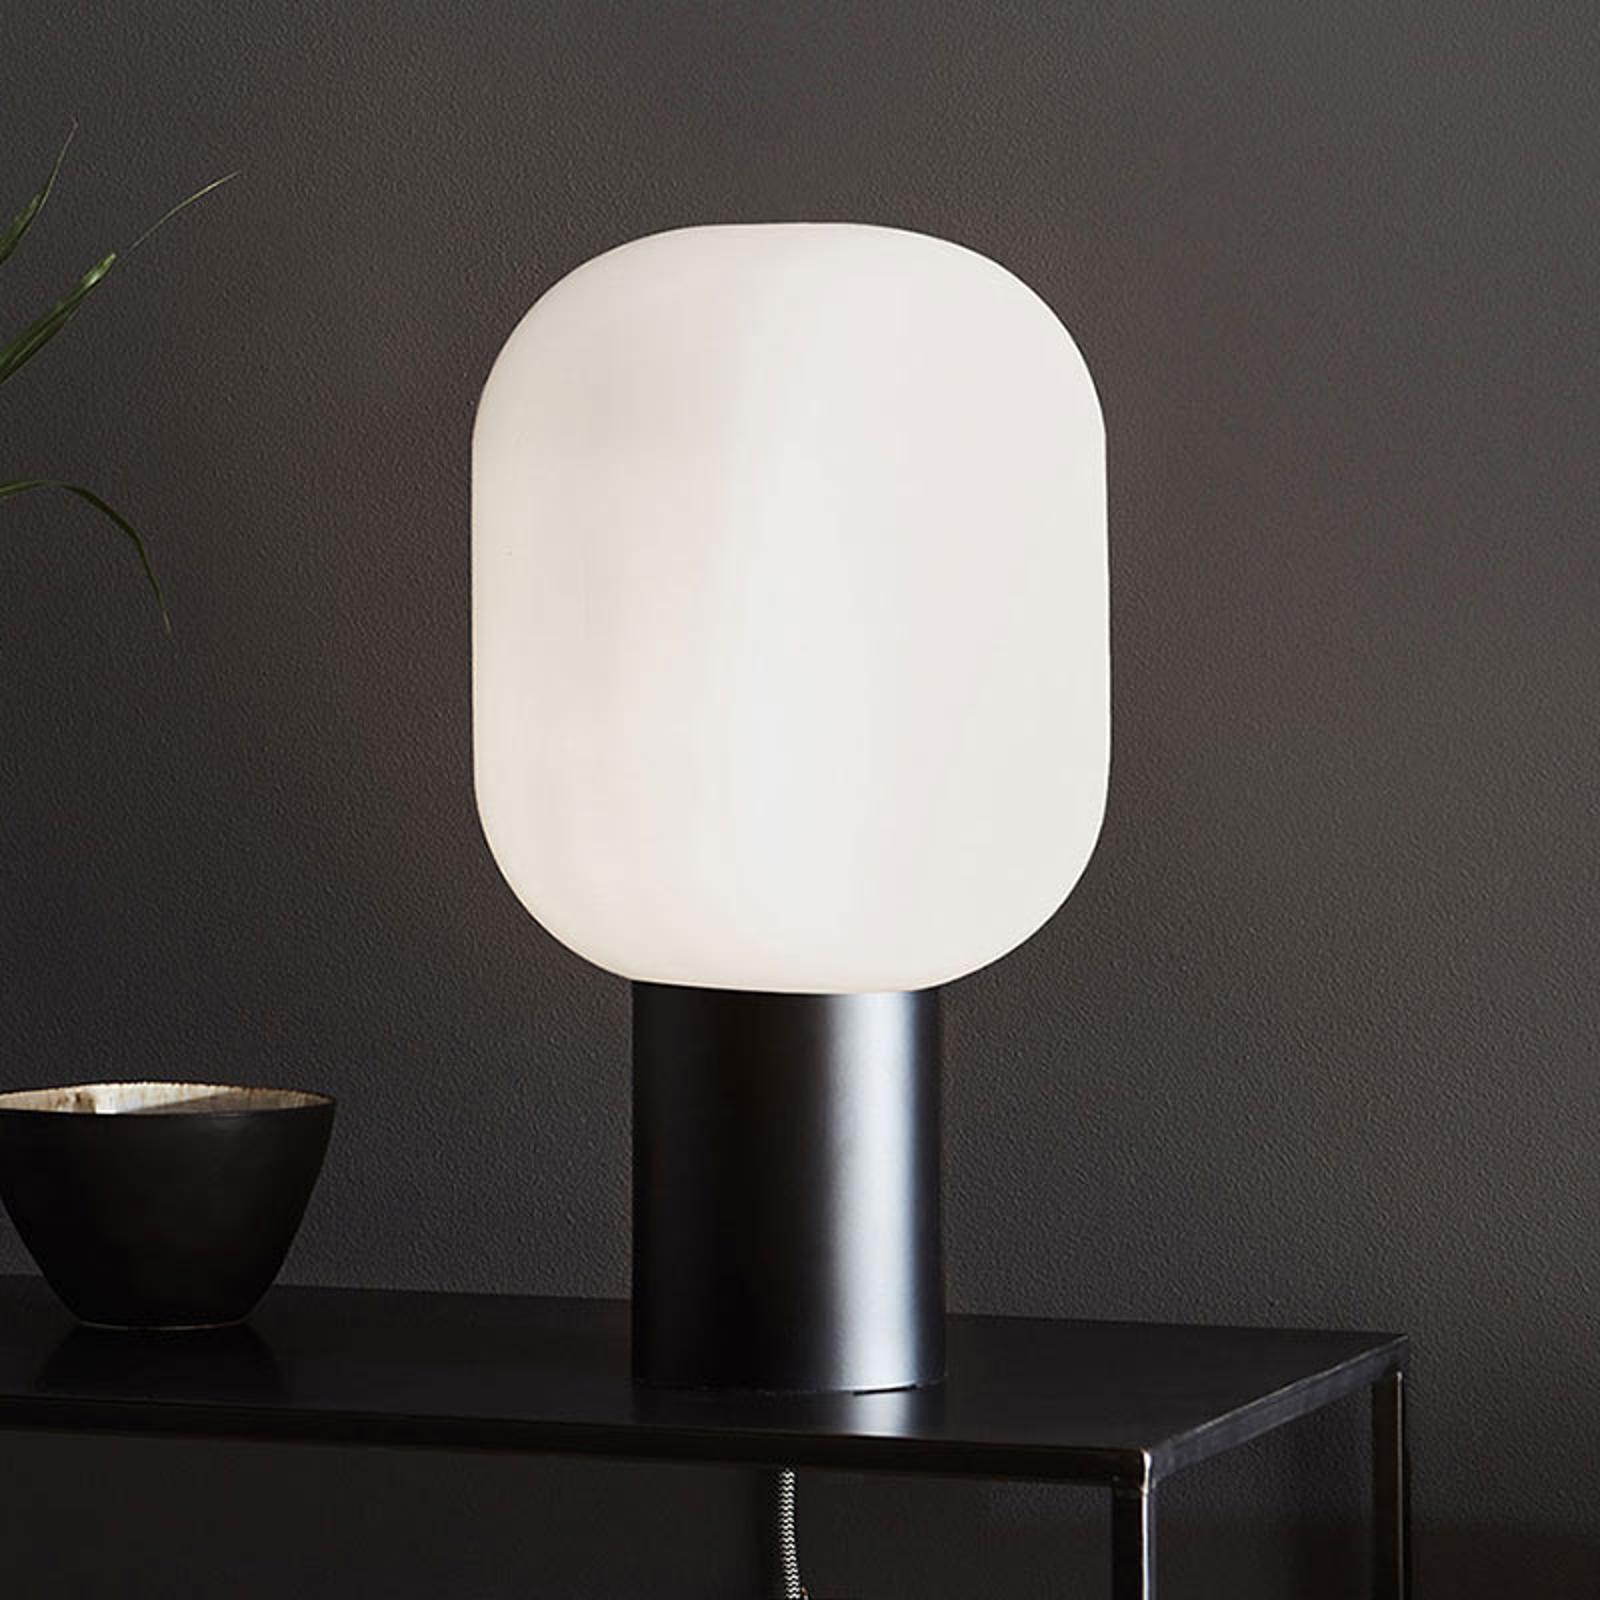 Brooklyn bordlampe, opalhvid glasskærm, 44 cm